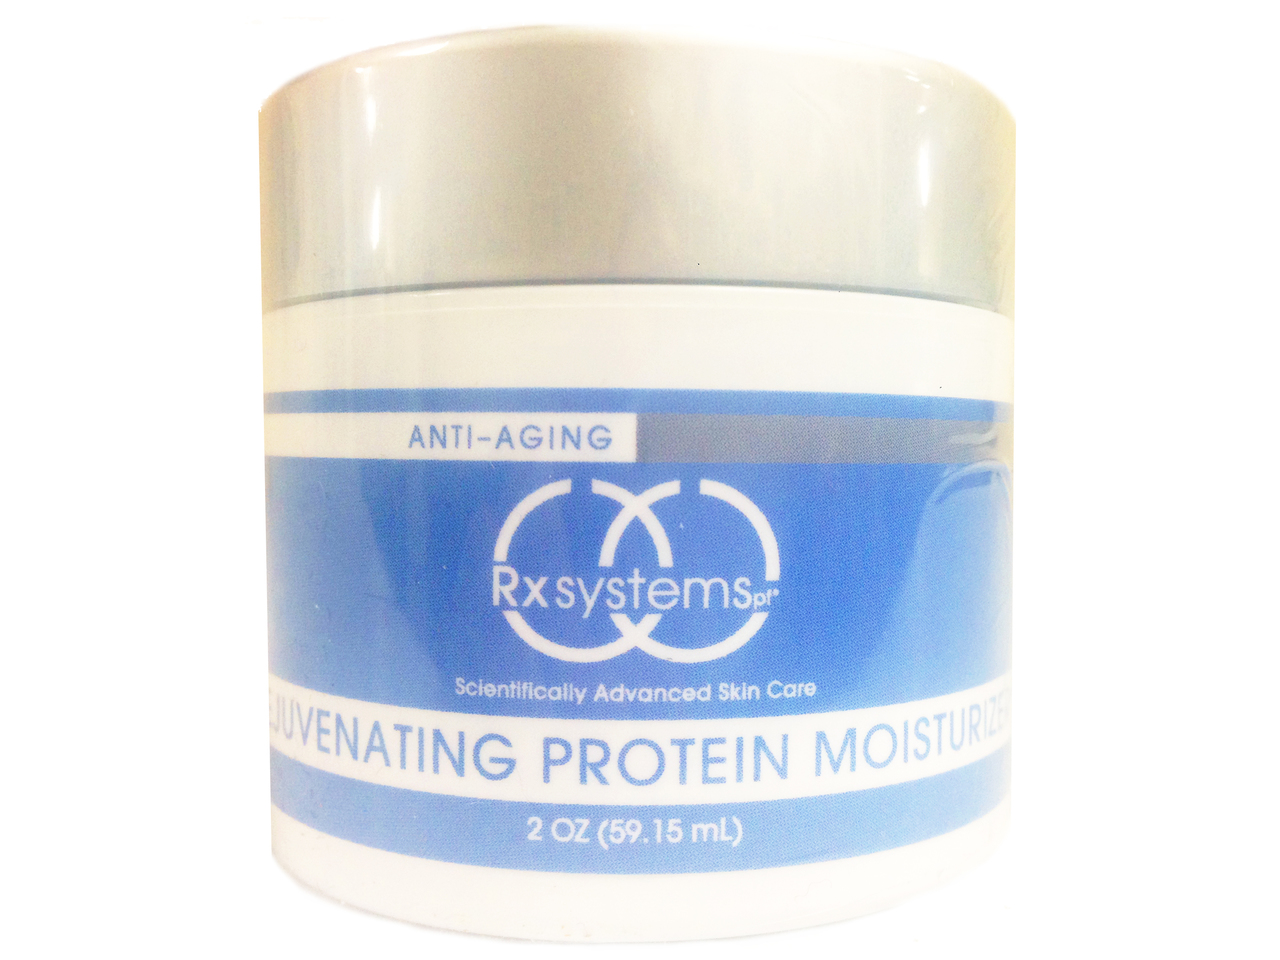 Rx Systems Rejuvenating Protein Moisturizer 2 oz